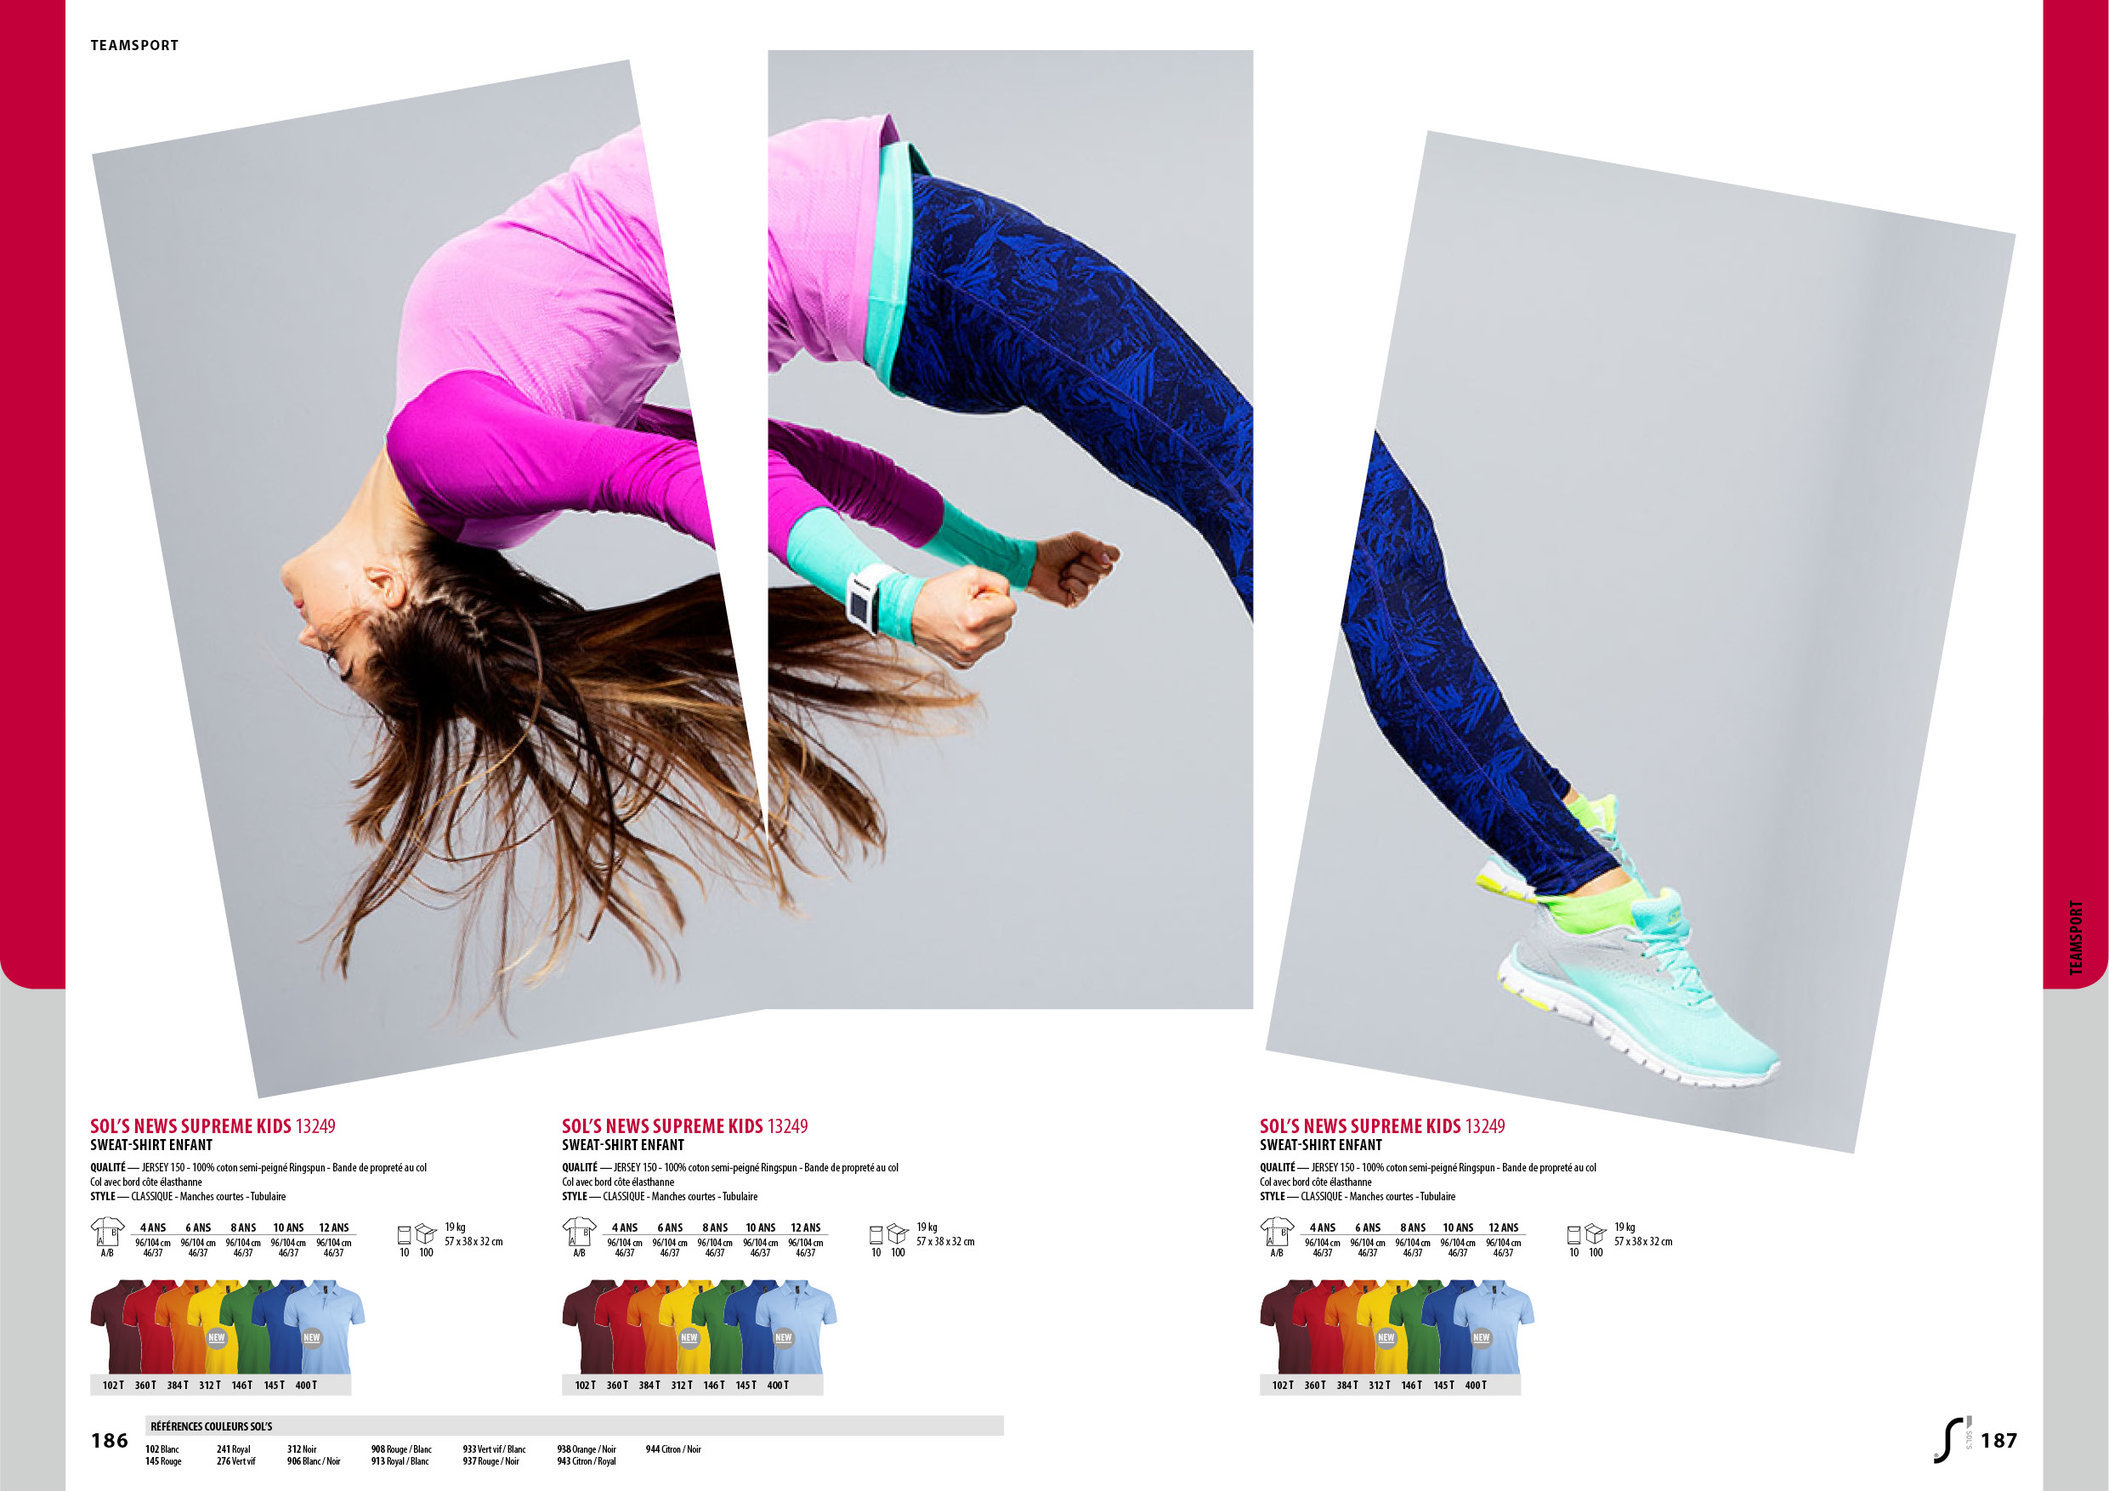 "<font color=""#aaa7a6"">Catalogue, maquette - Axe 1 (7/7).</font>"